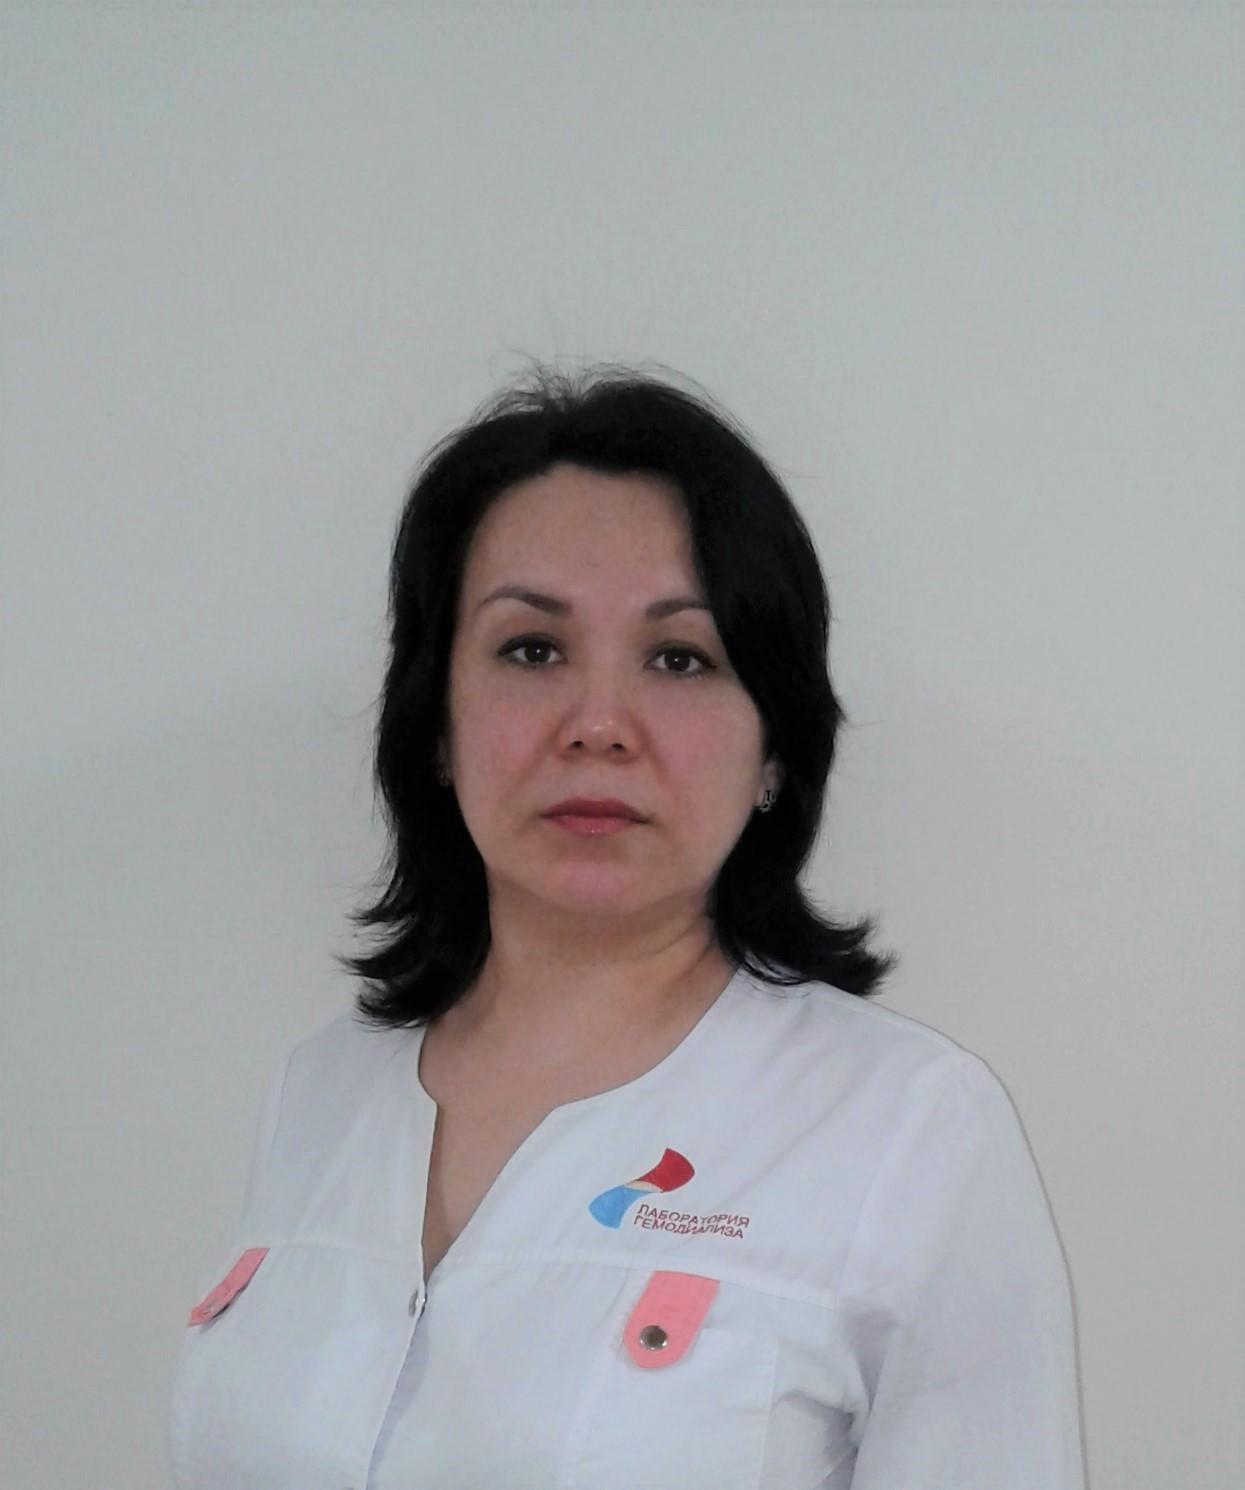 Губайдуллина Алия Радмиловна